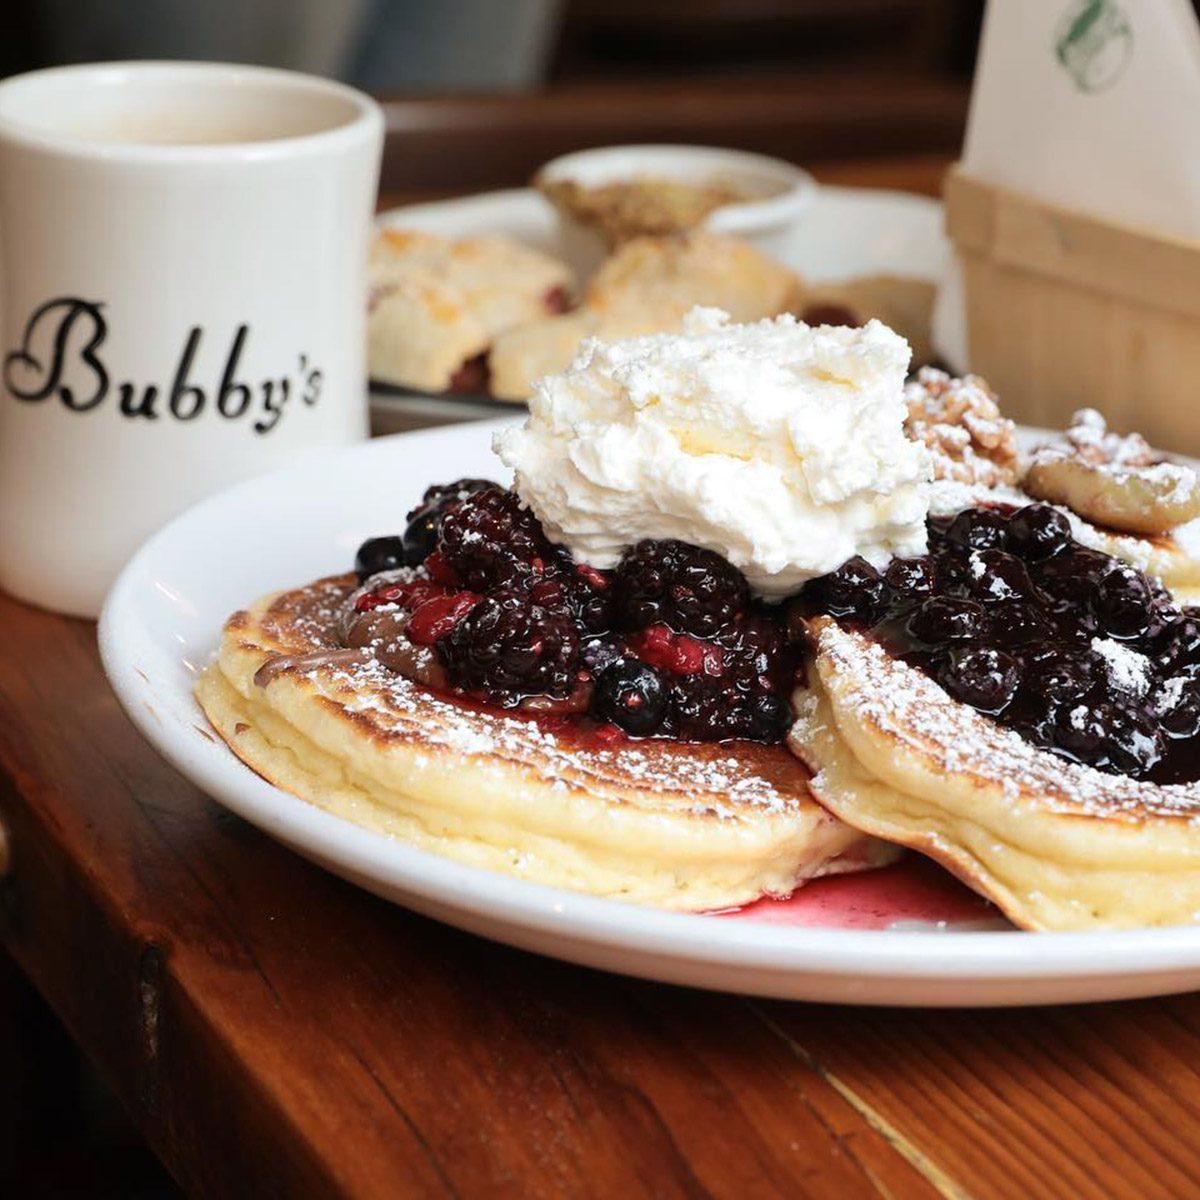 Bubby's, New York City pancakes